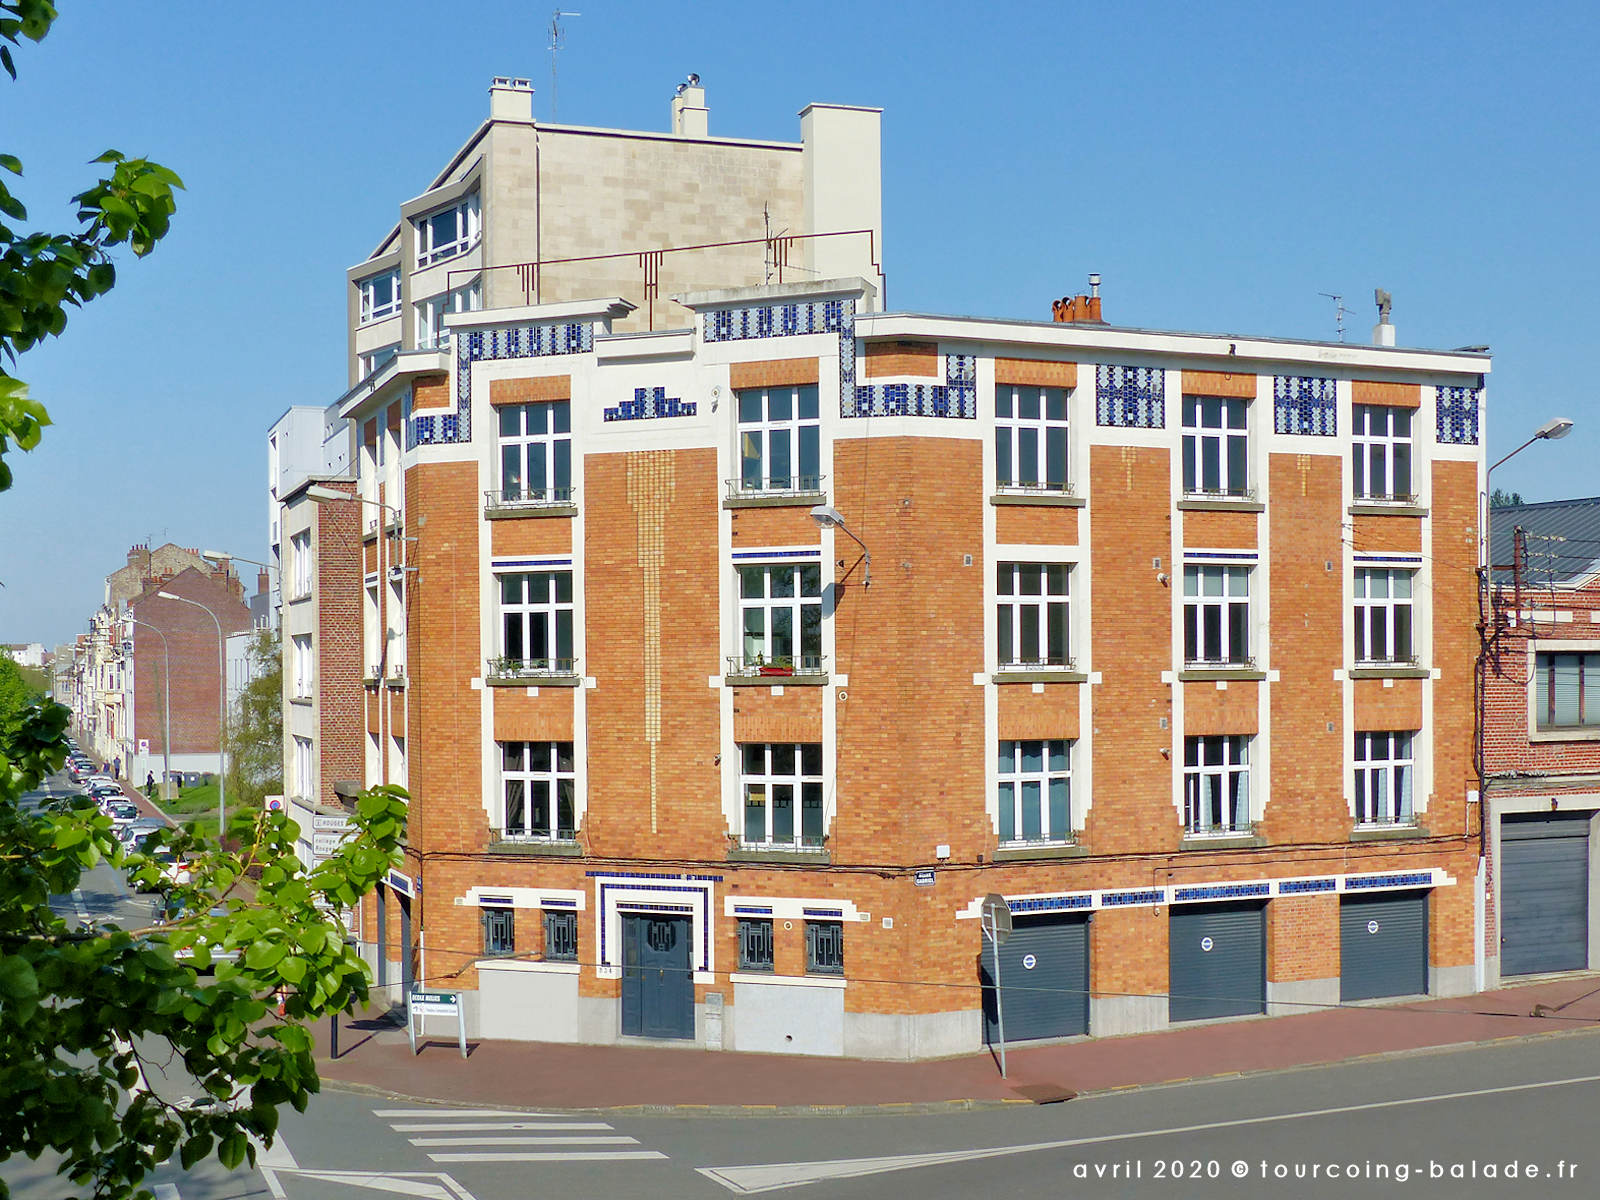 Architecture STyle Art Deco, Claquant Architecte, Marcq 2020